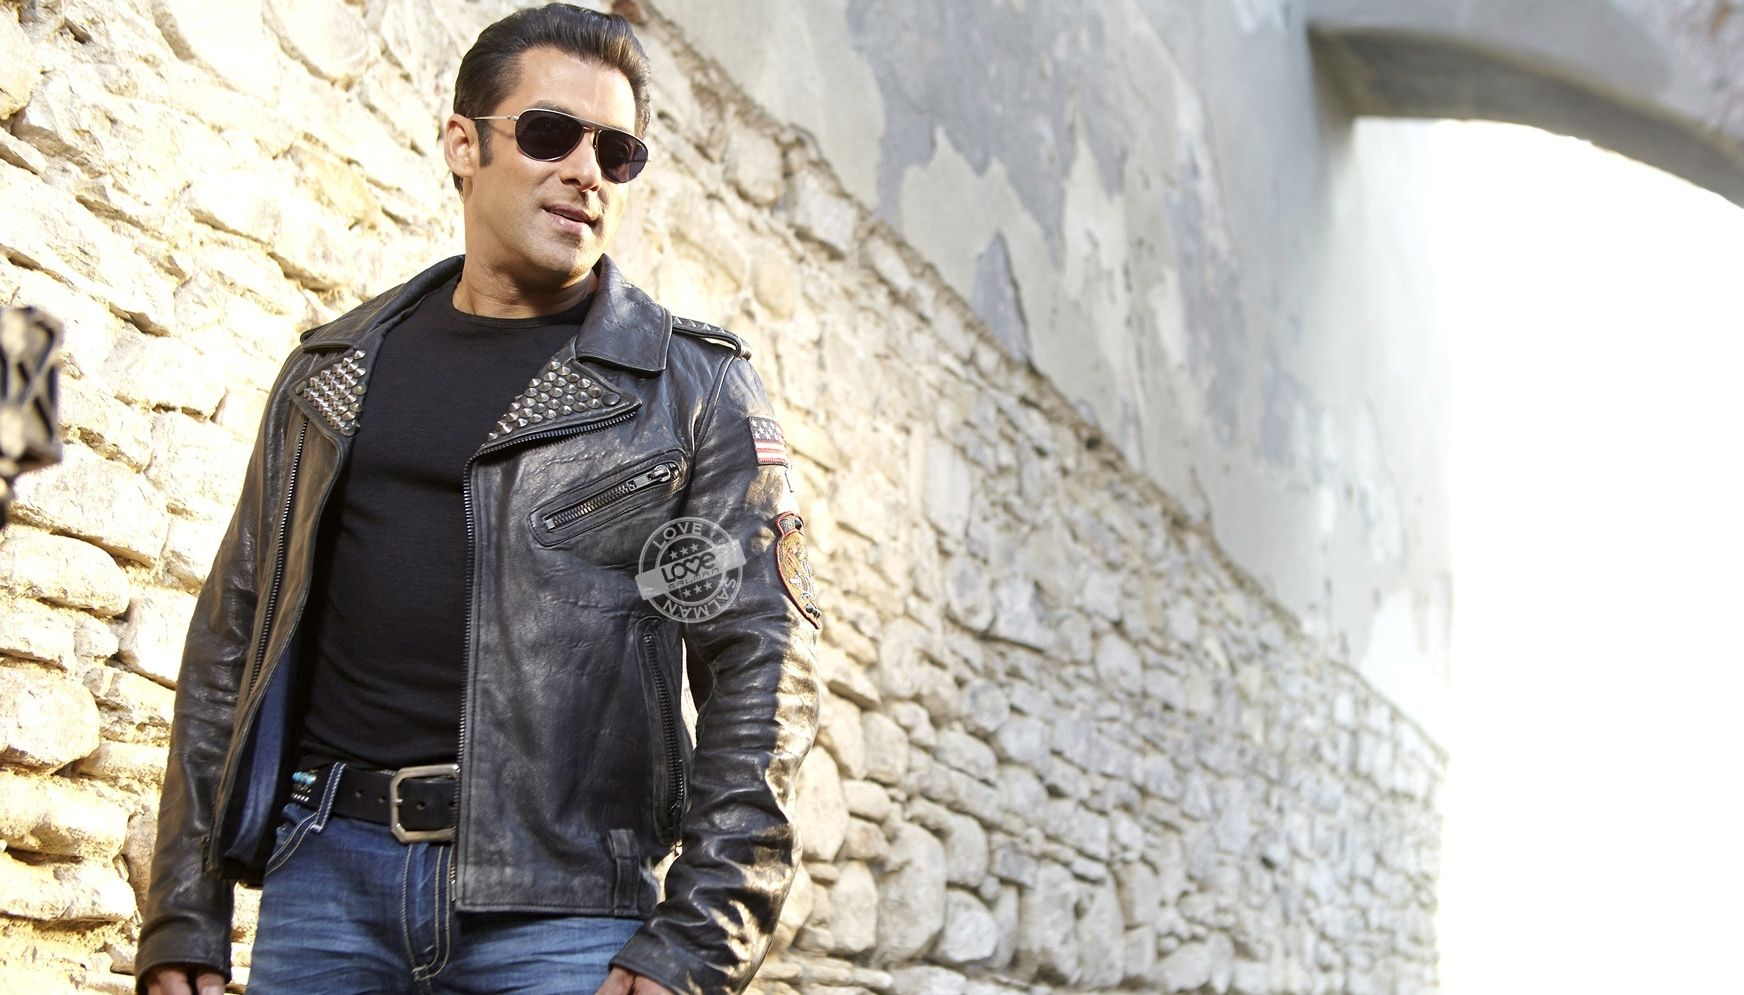 Wallpaper download bollywood actors - Bollywood Actors Salman Khan Hd Wallpaper Download